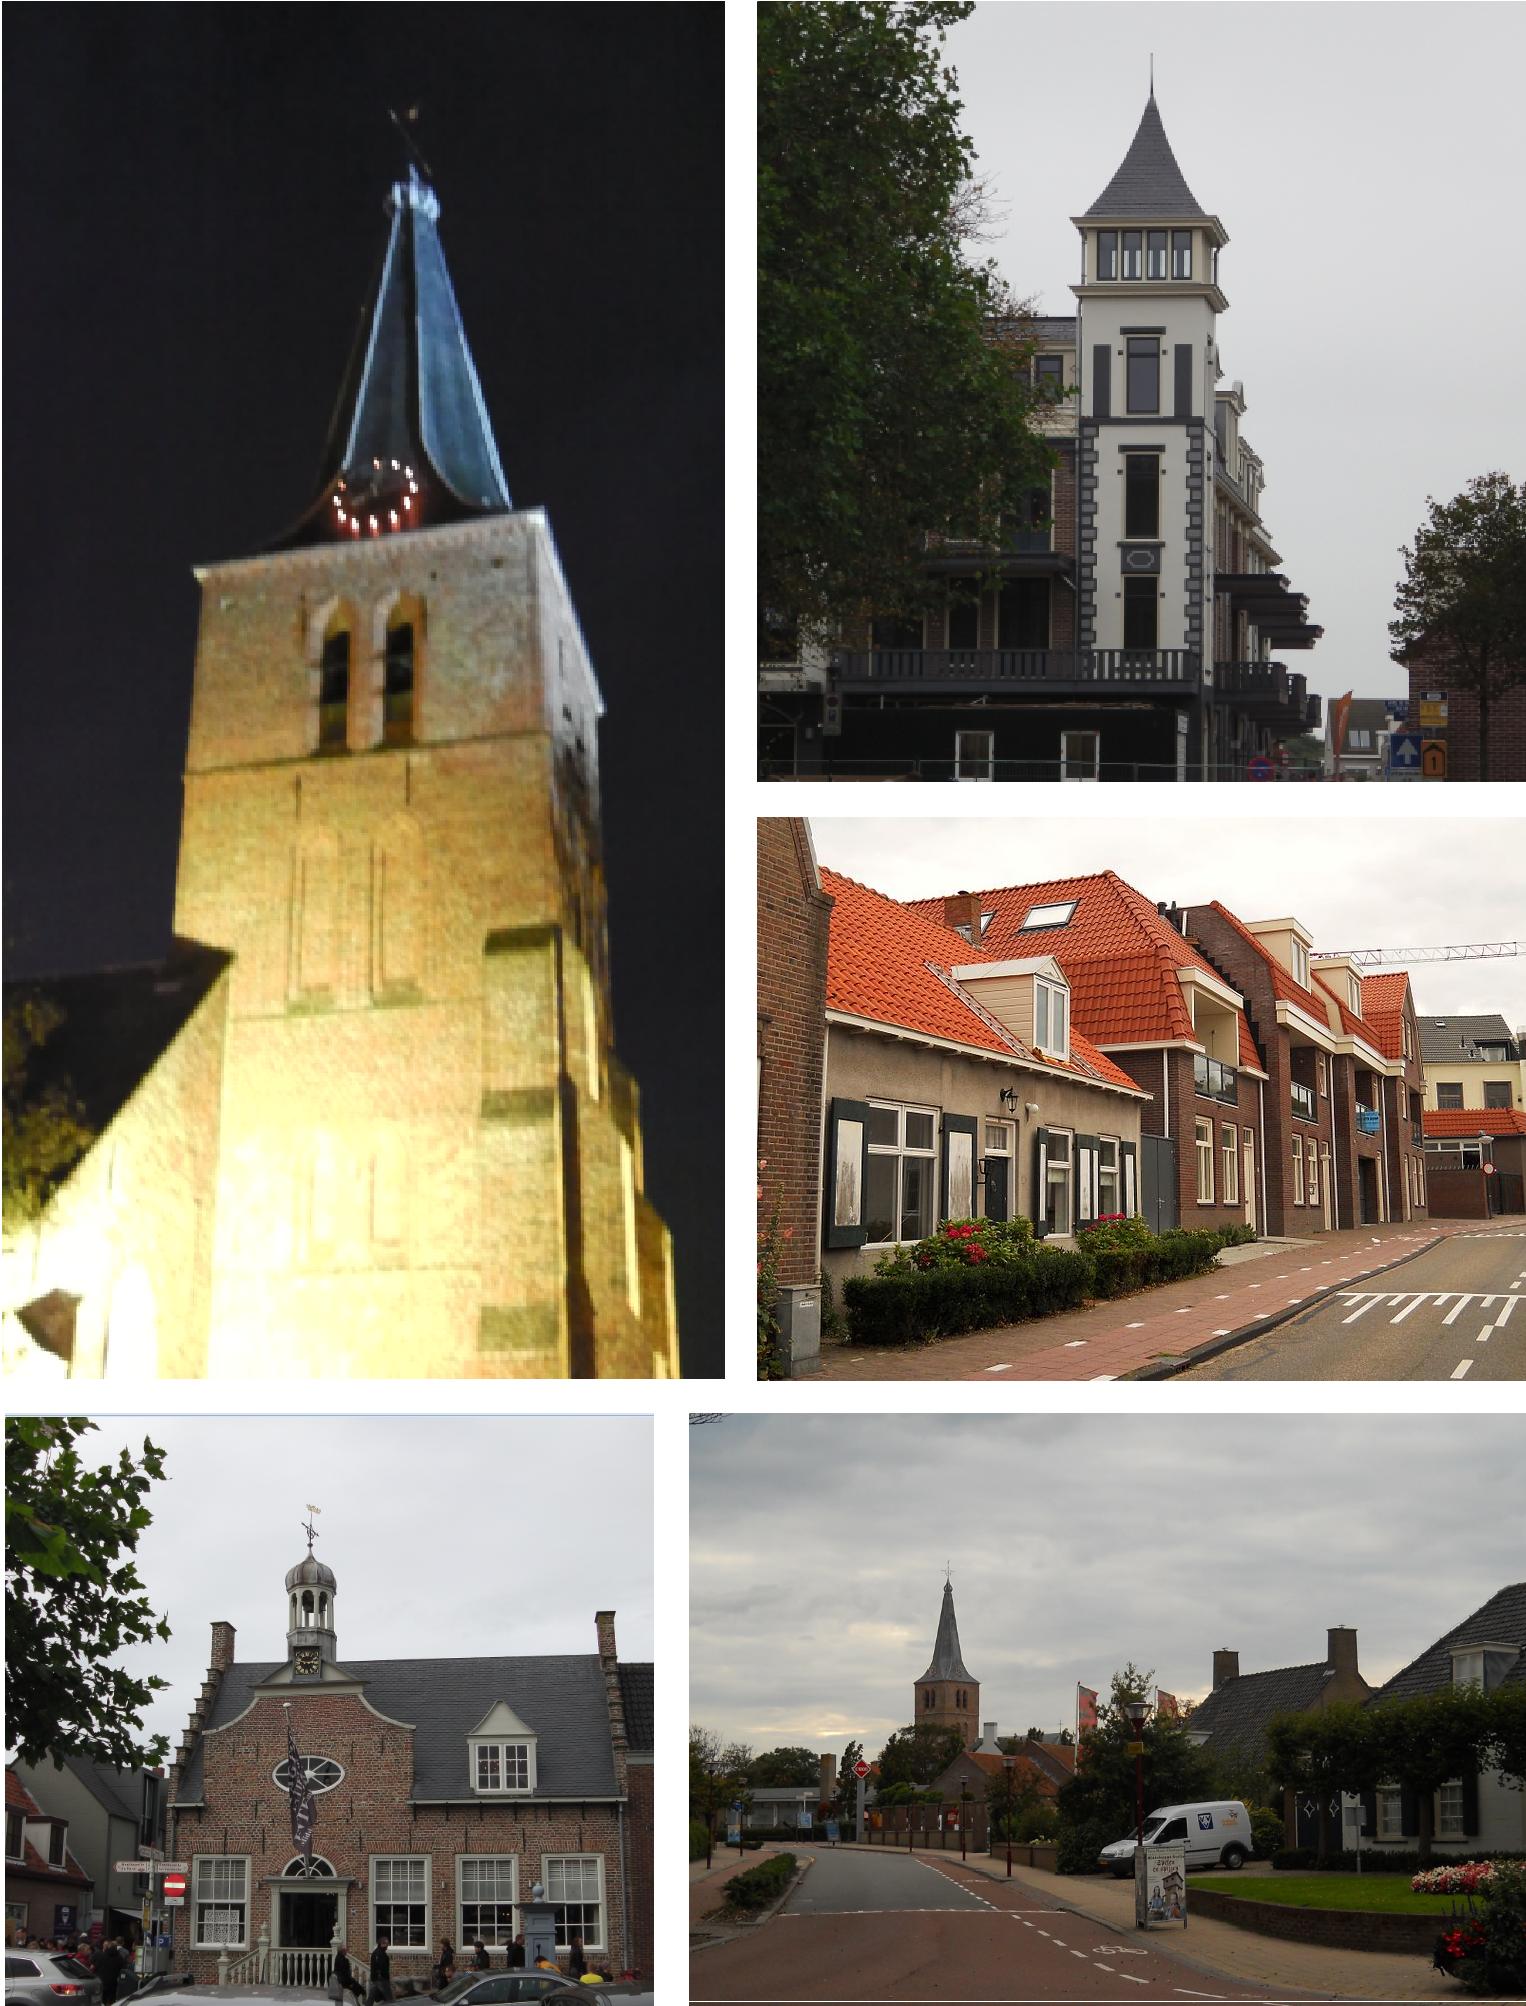 Domburg (Herbehereak)